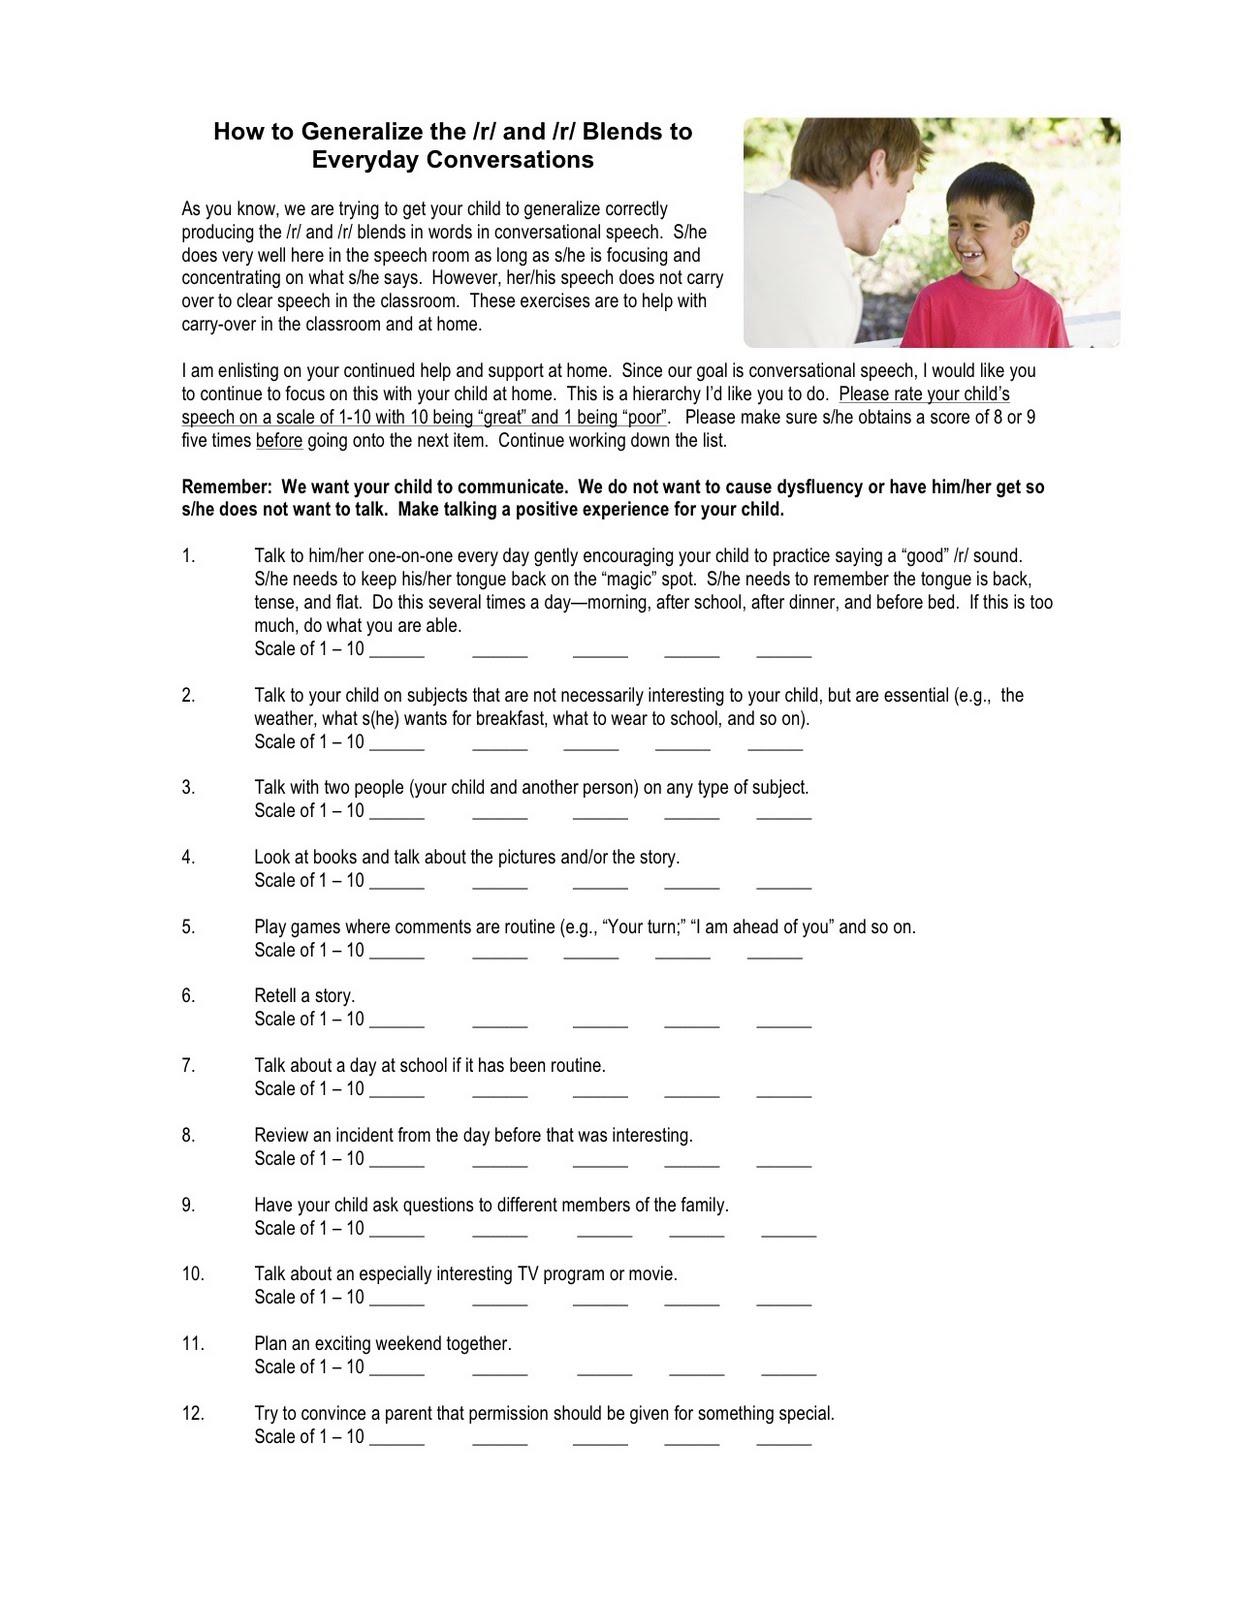 speeches about homework homework persuasive essay a persuasive essay about homework should be